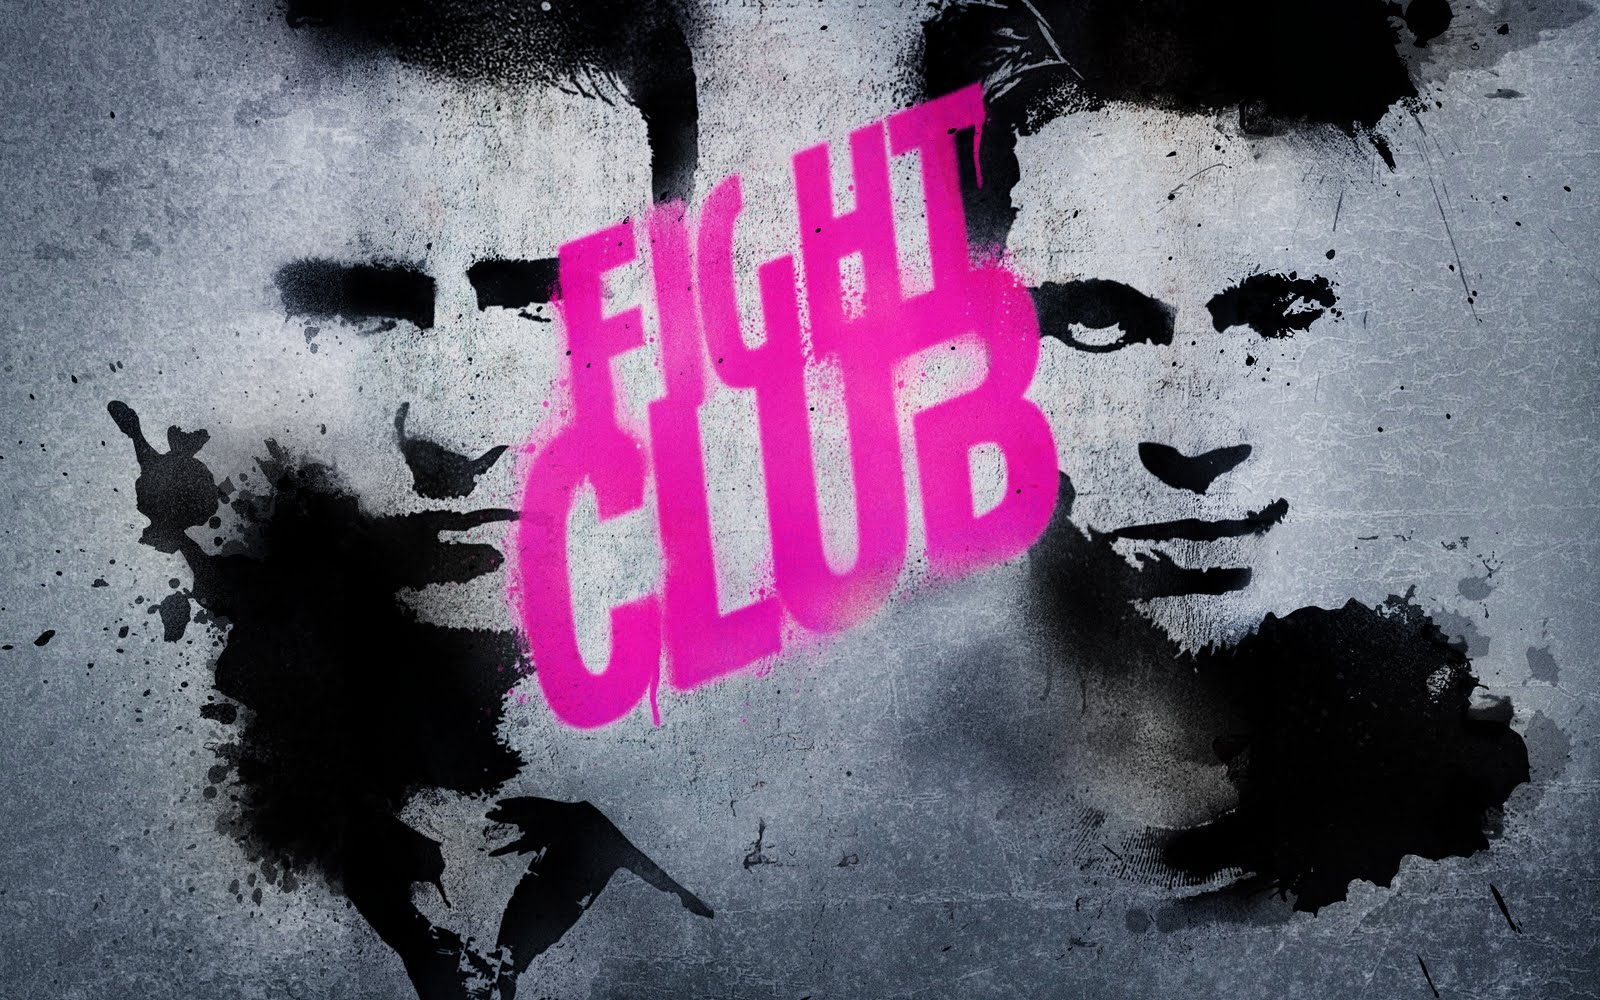 http://2.bp.blogspot.com/-0UiJ4zU0ZDg/TubZU7JKbMI/AAAAAAAABNw/npuDhbYHX10/s1600/14709_fight_club.jpg